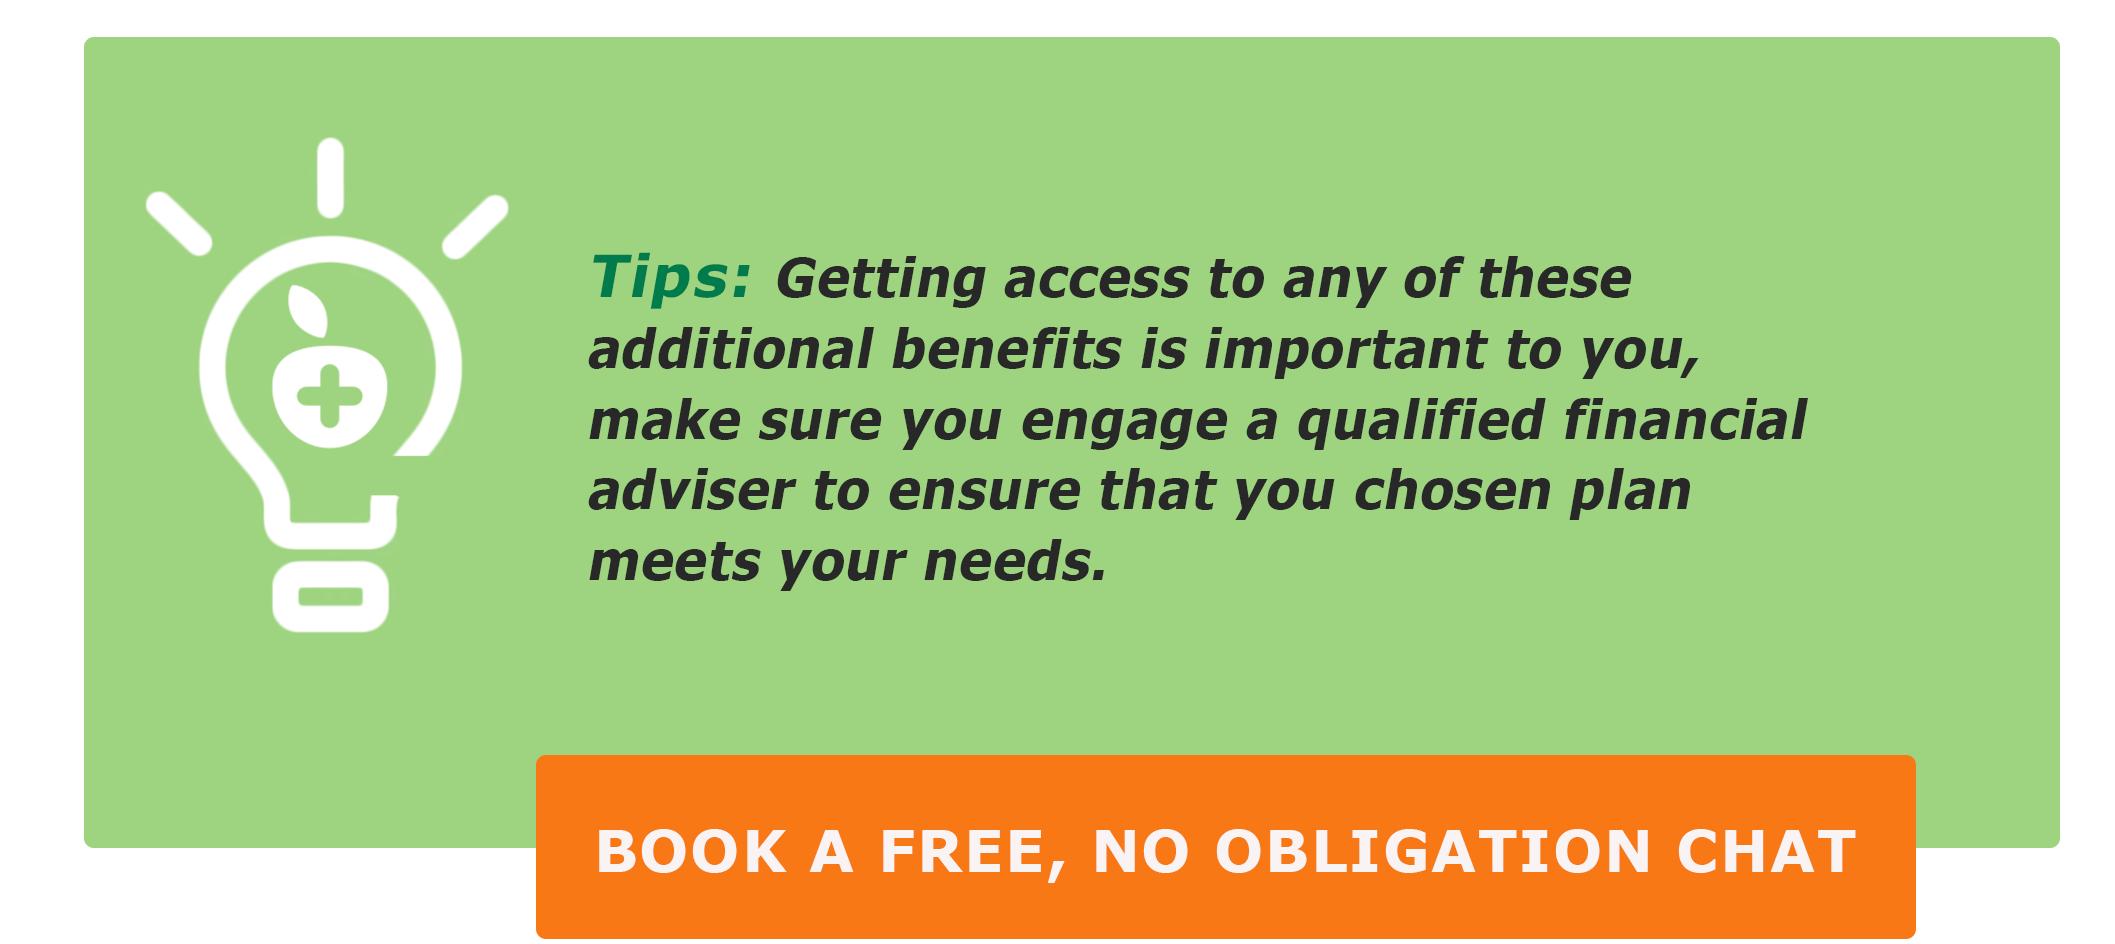 life insurance tip 3